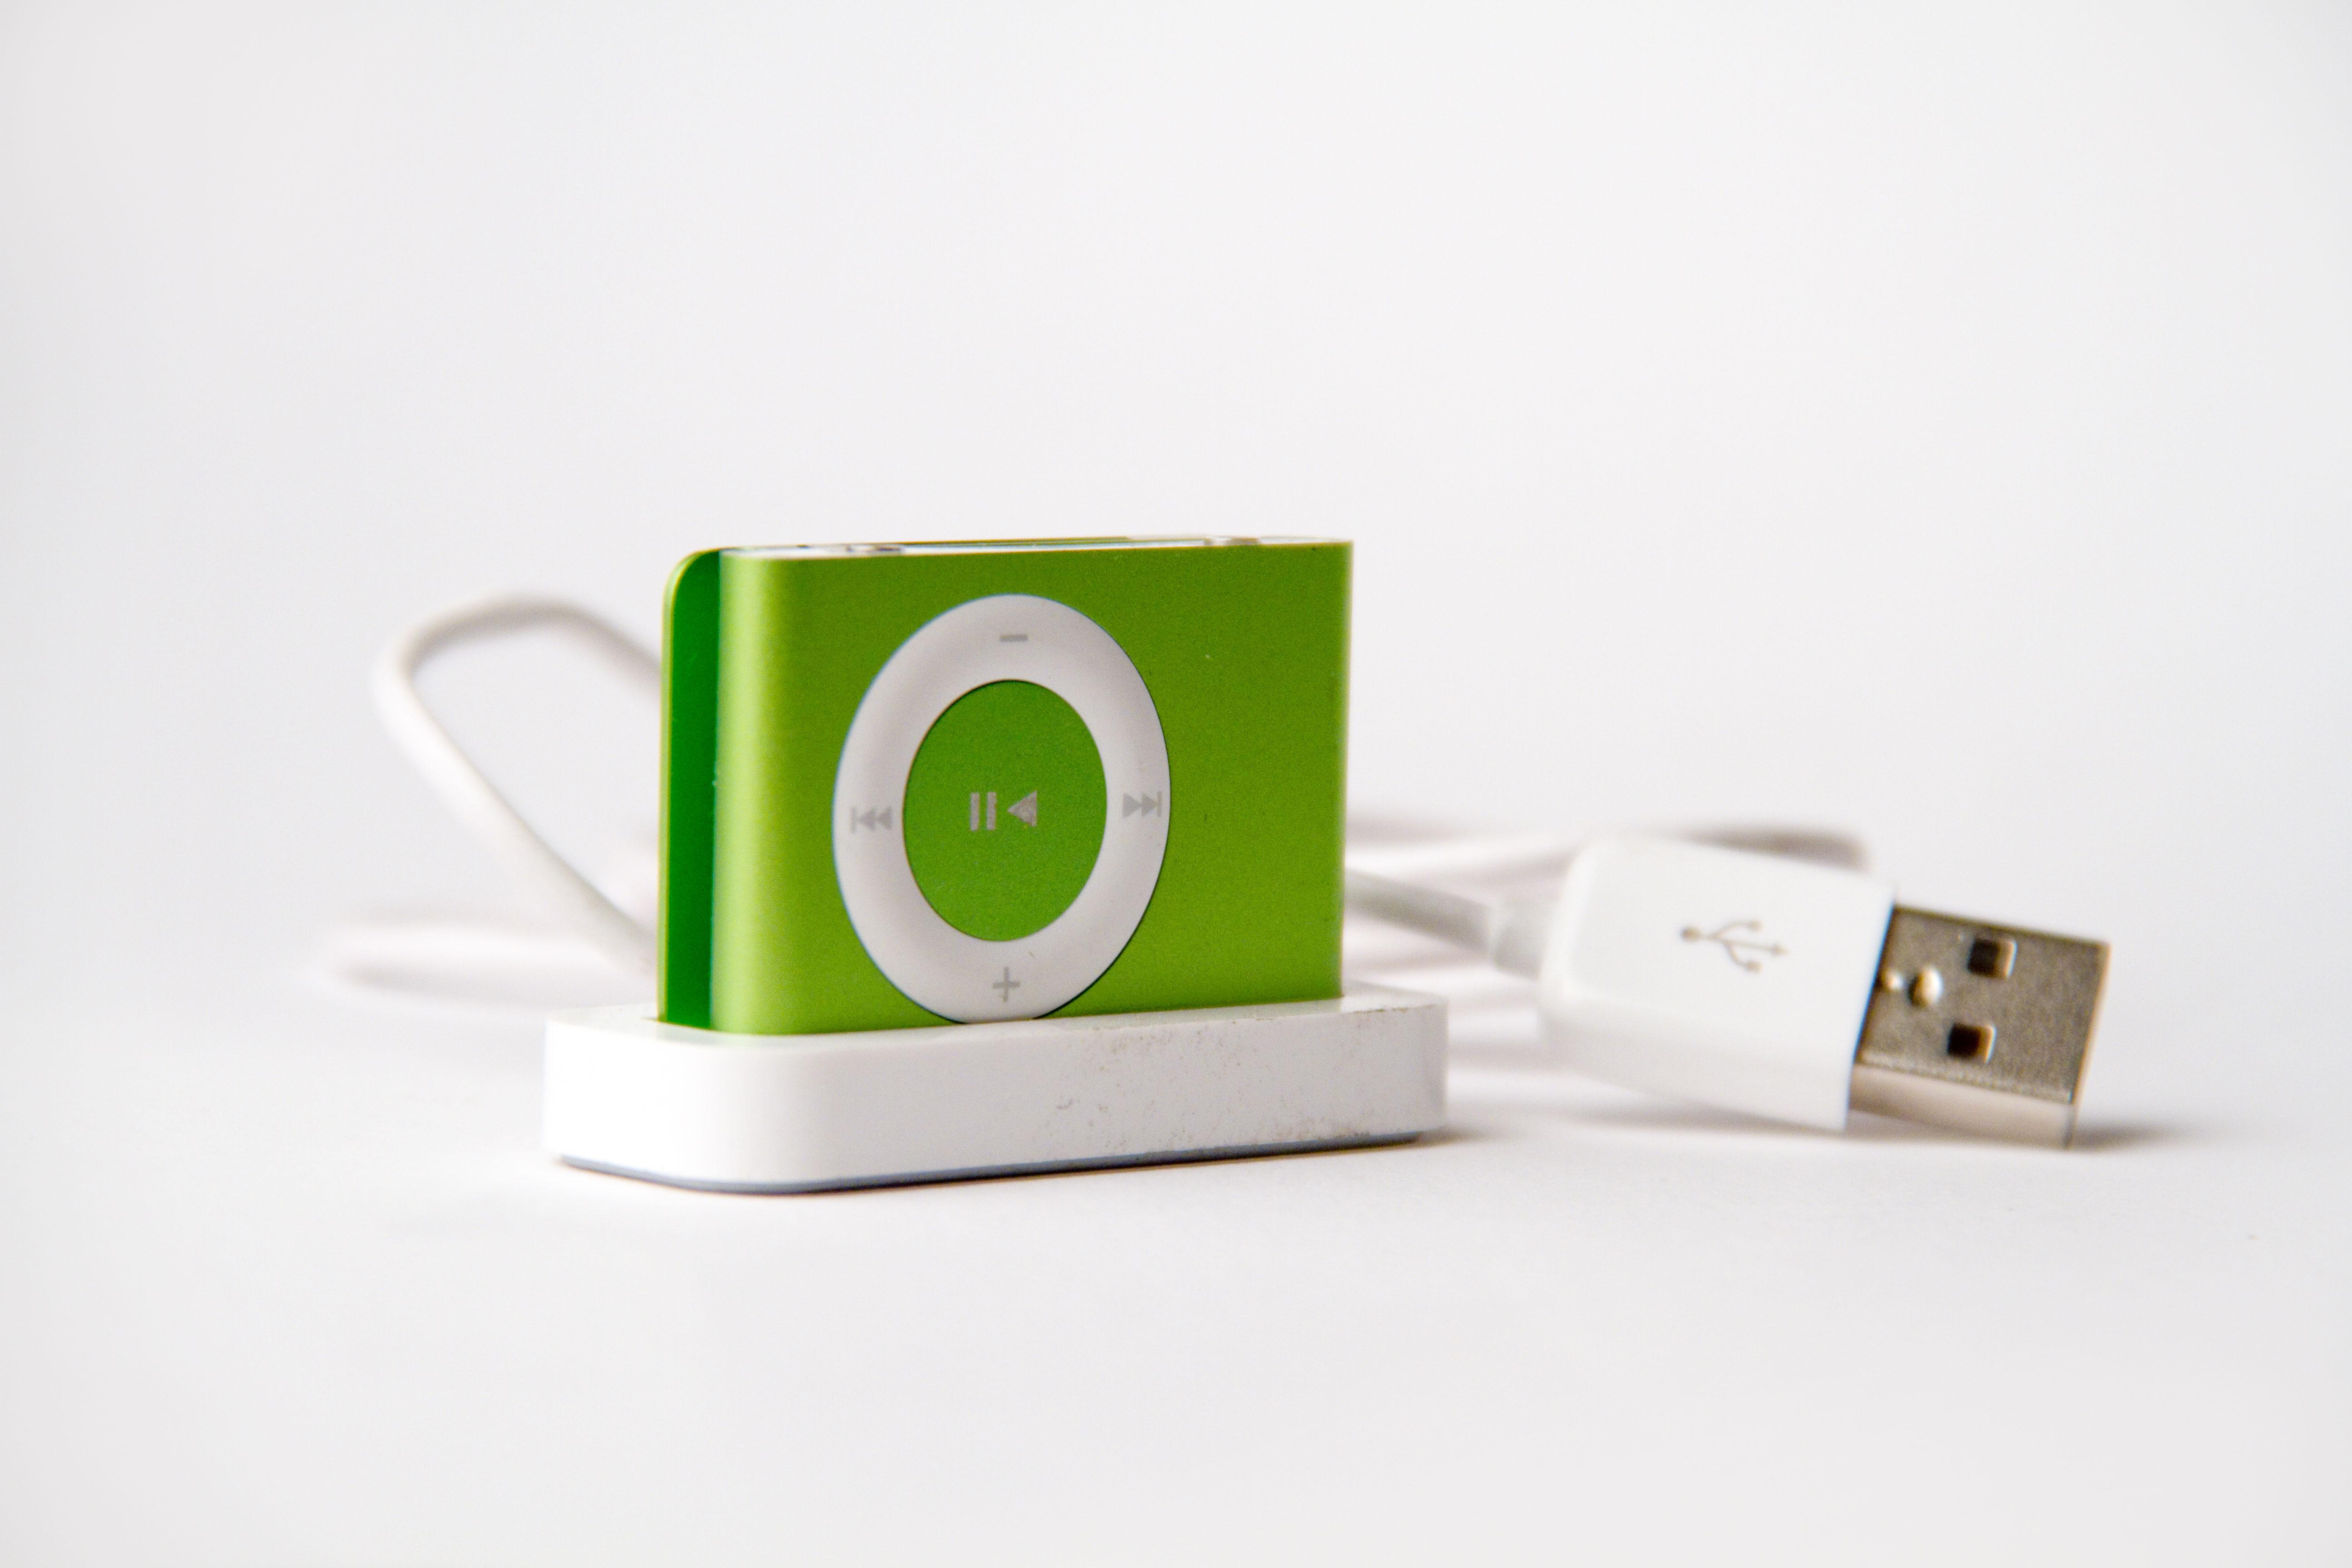 File Apple Ipod Shuffle Second Generation Green Jpg